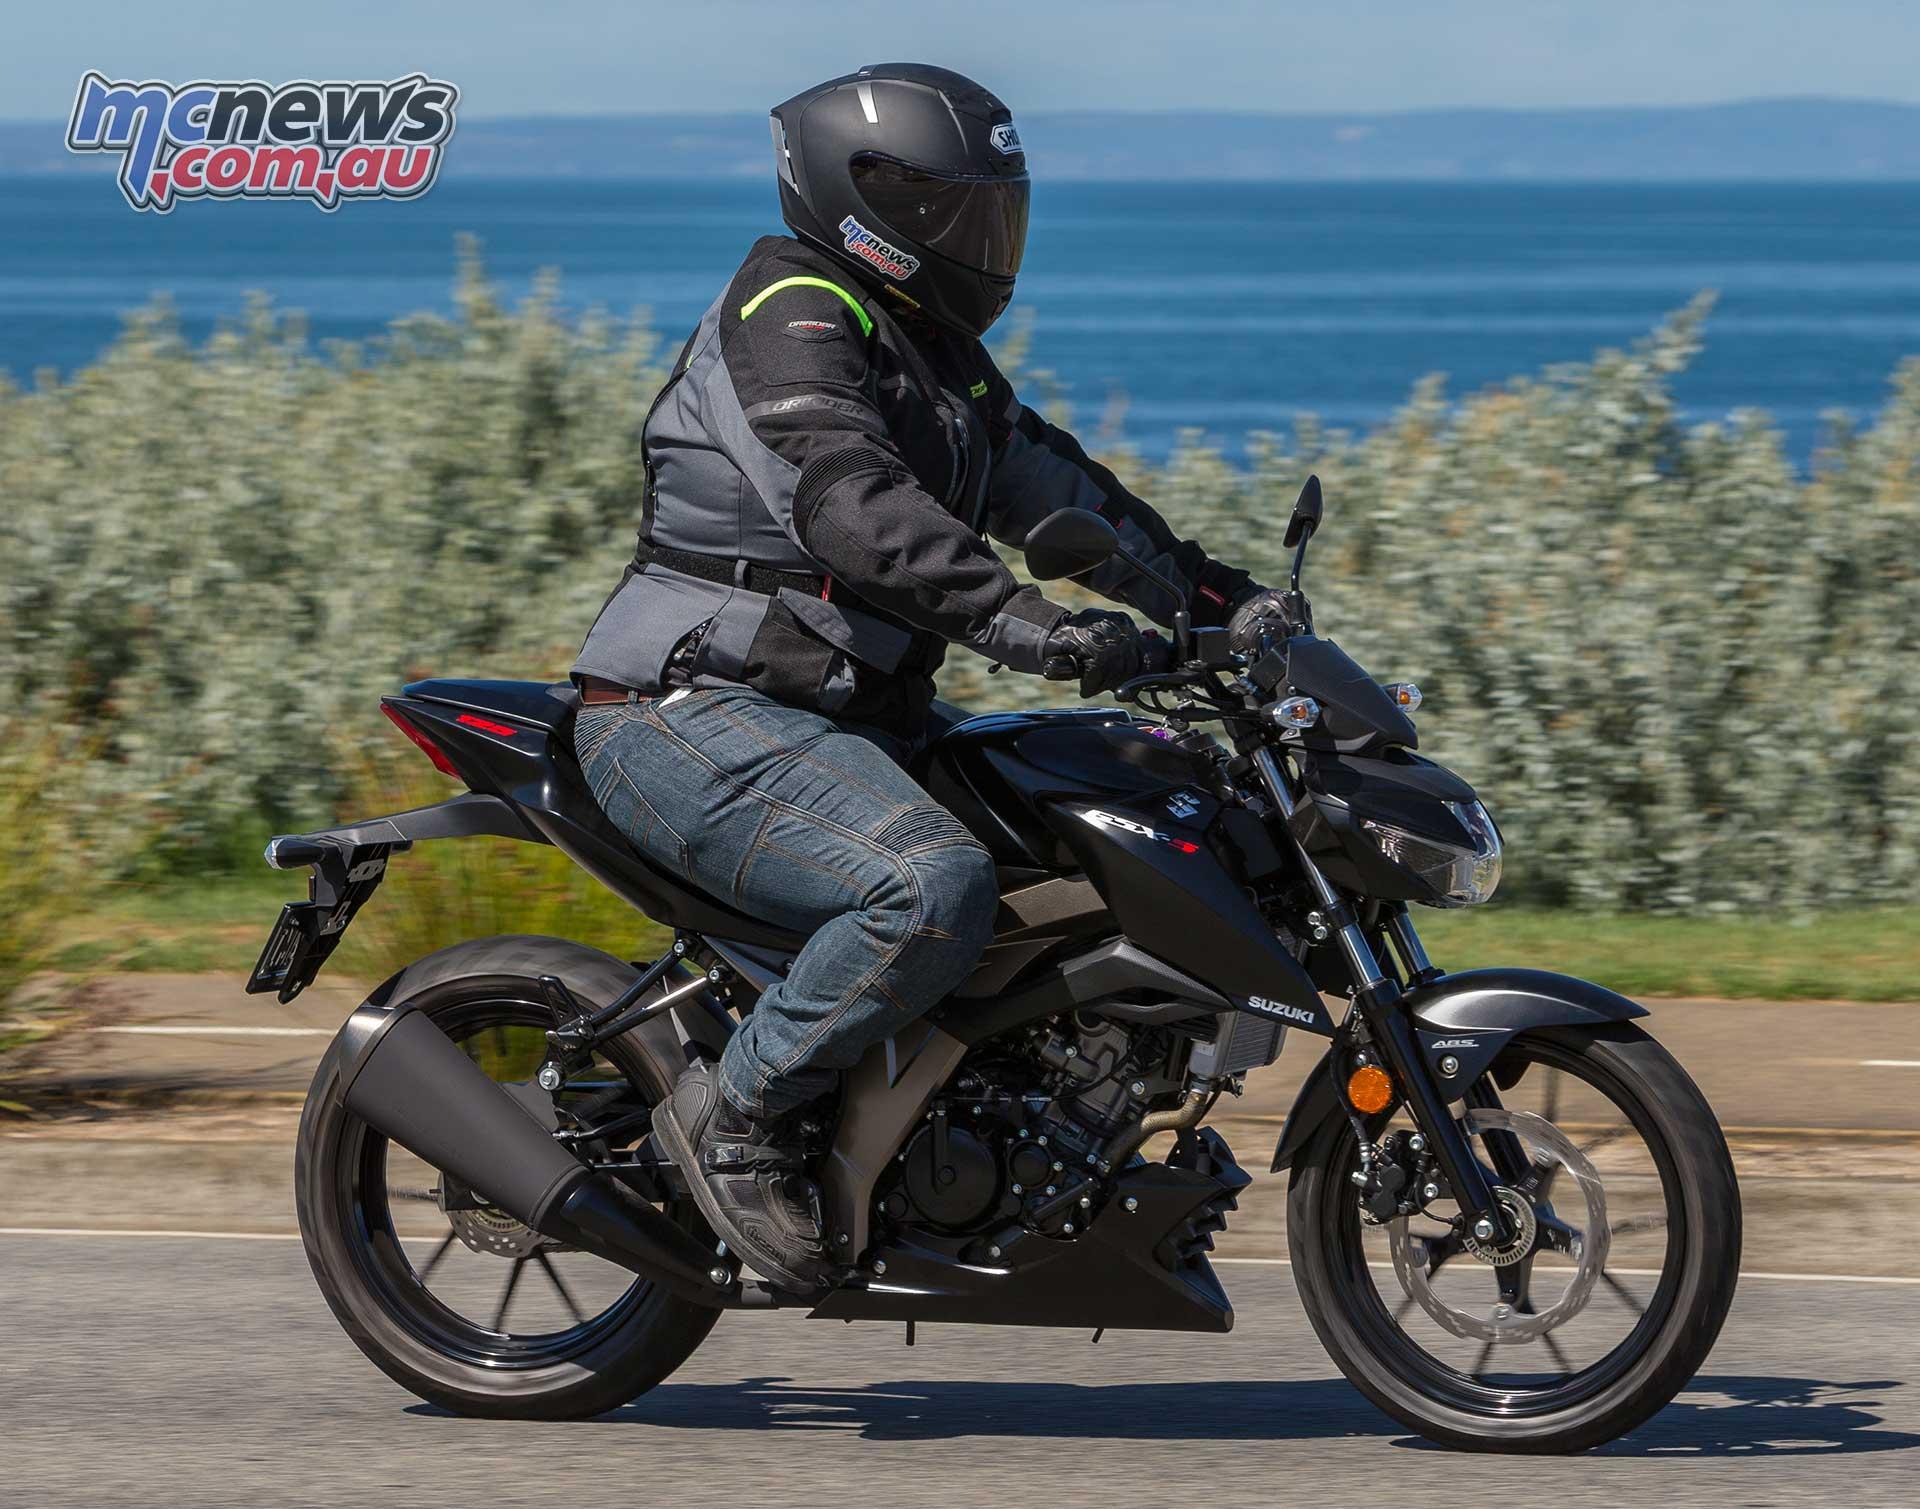 Suzuki Gsx S125 Gsx R125 Review Motorcycle Test Mcnews Com Au